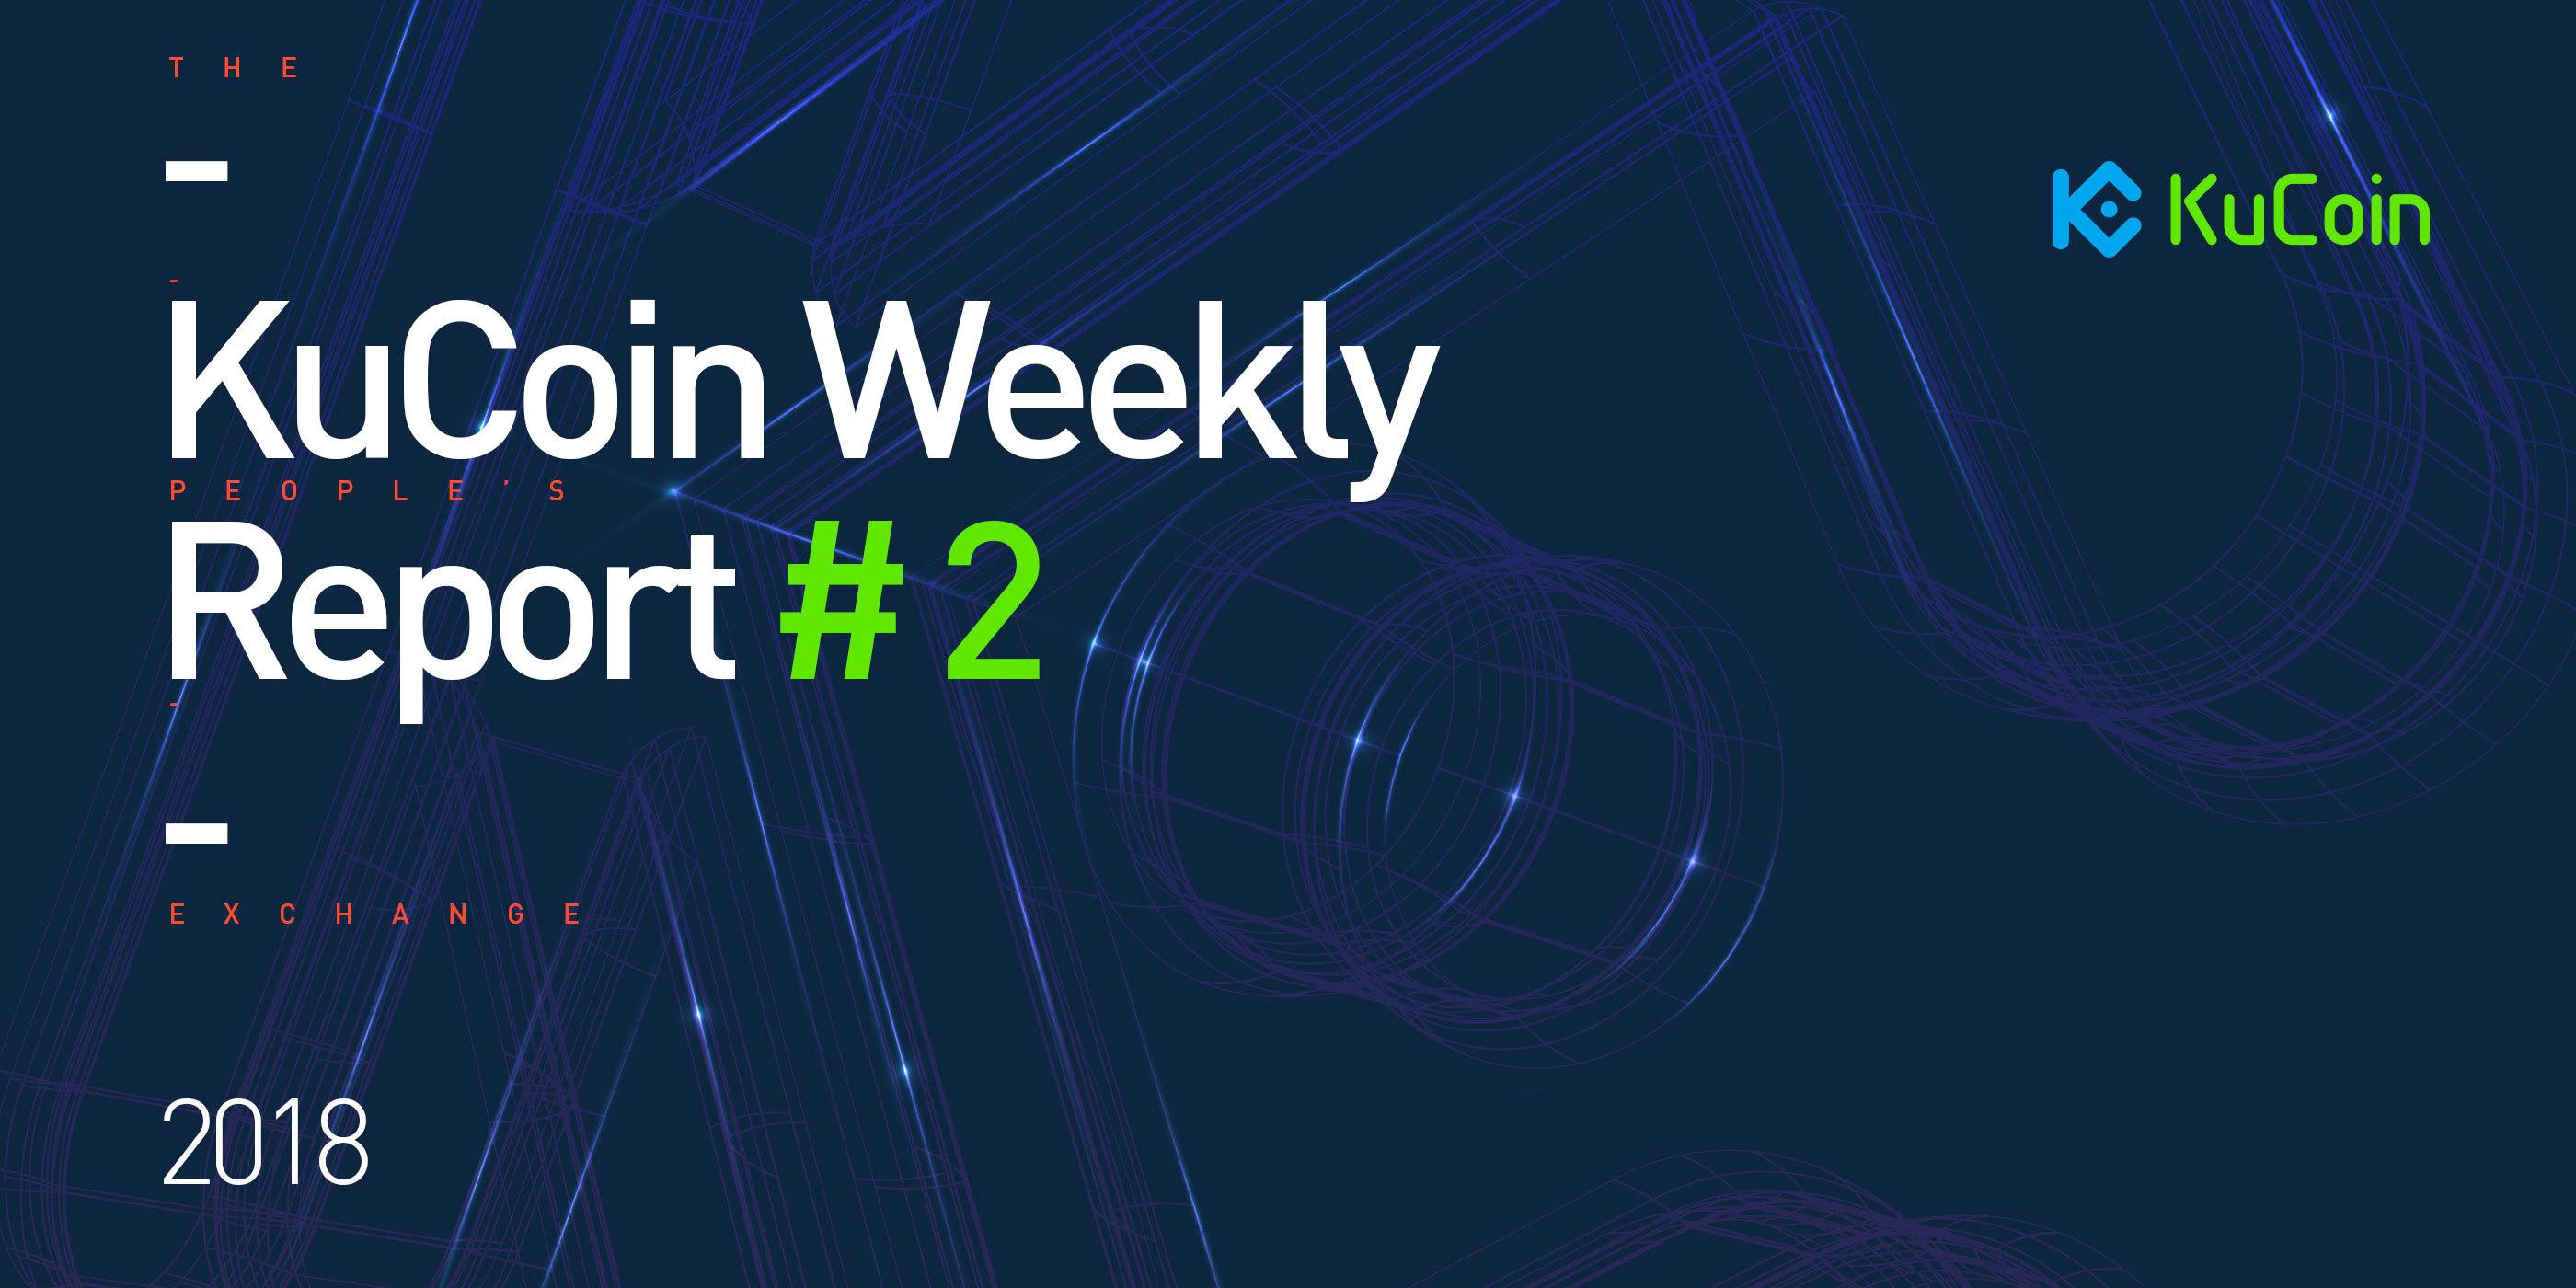 KuCoin Weekly Report #2